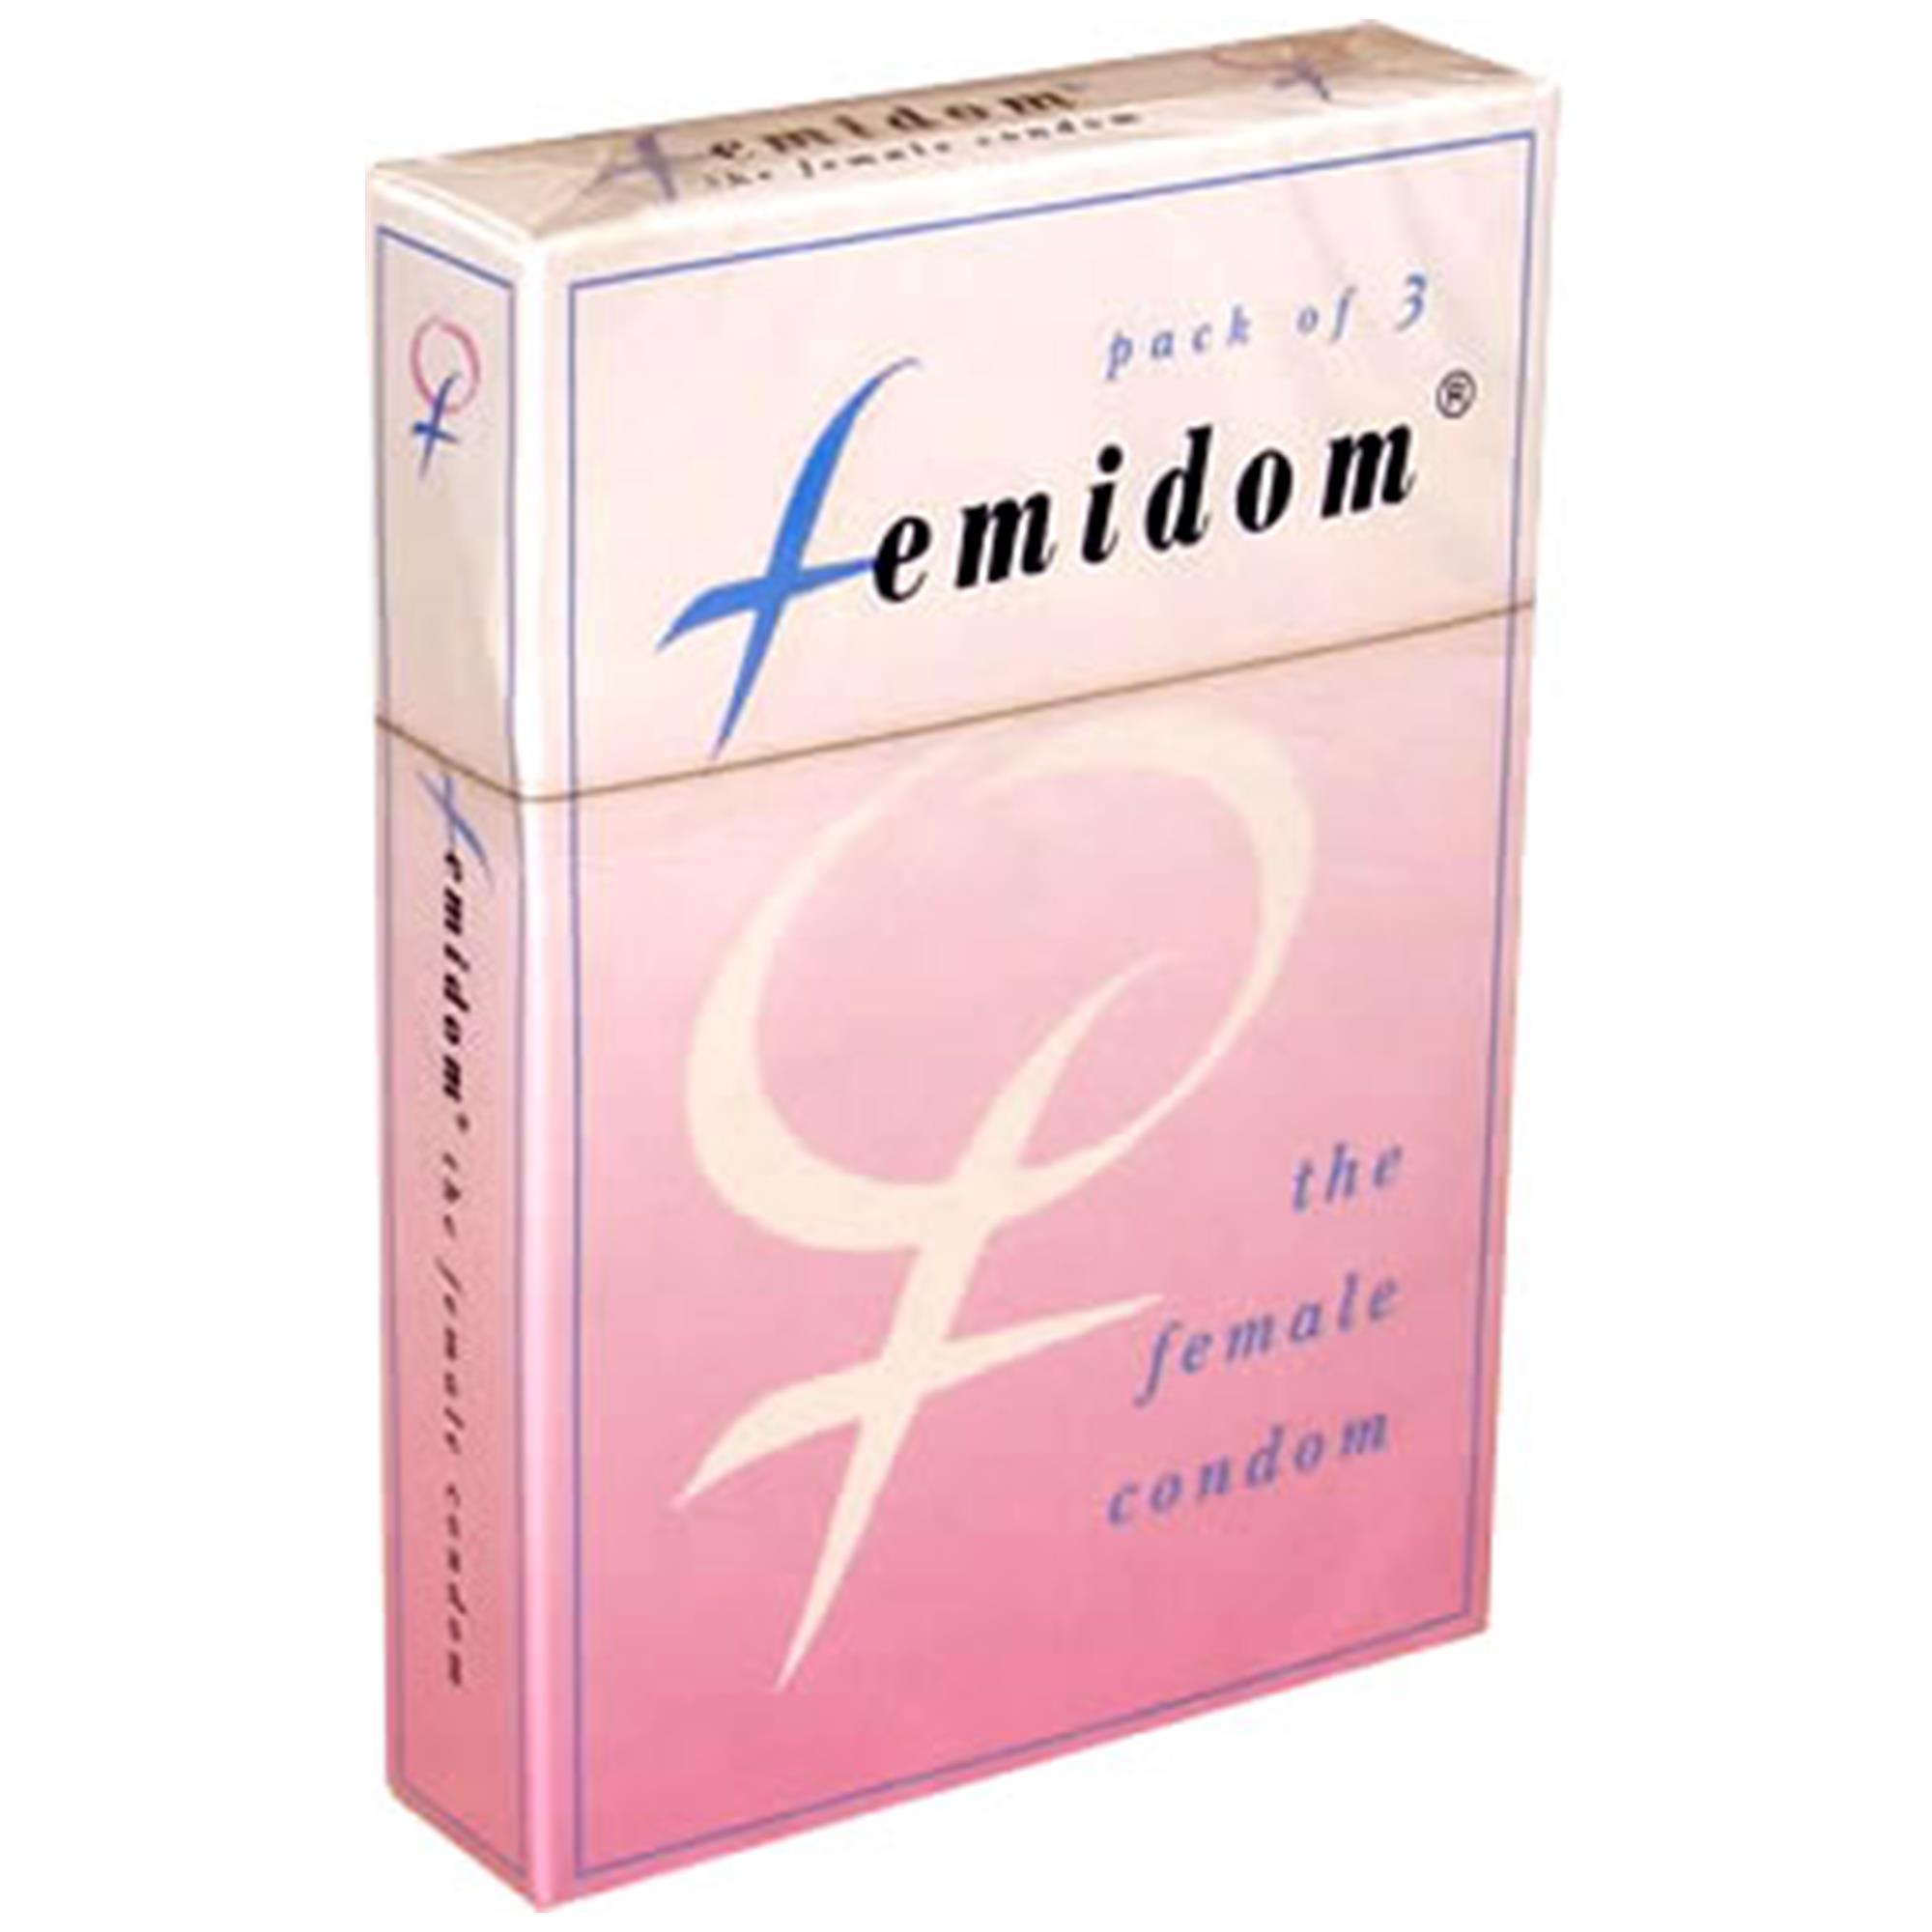 Femidom 3pc